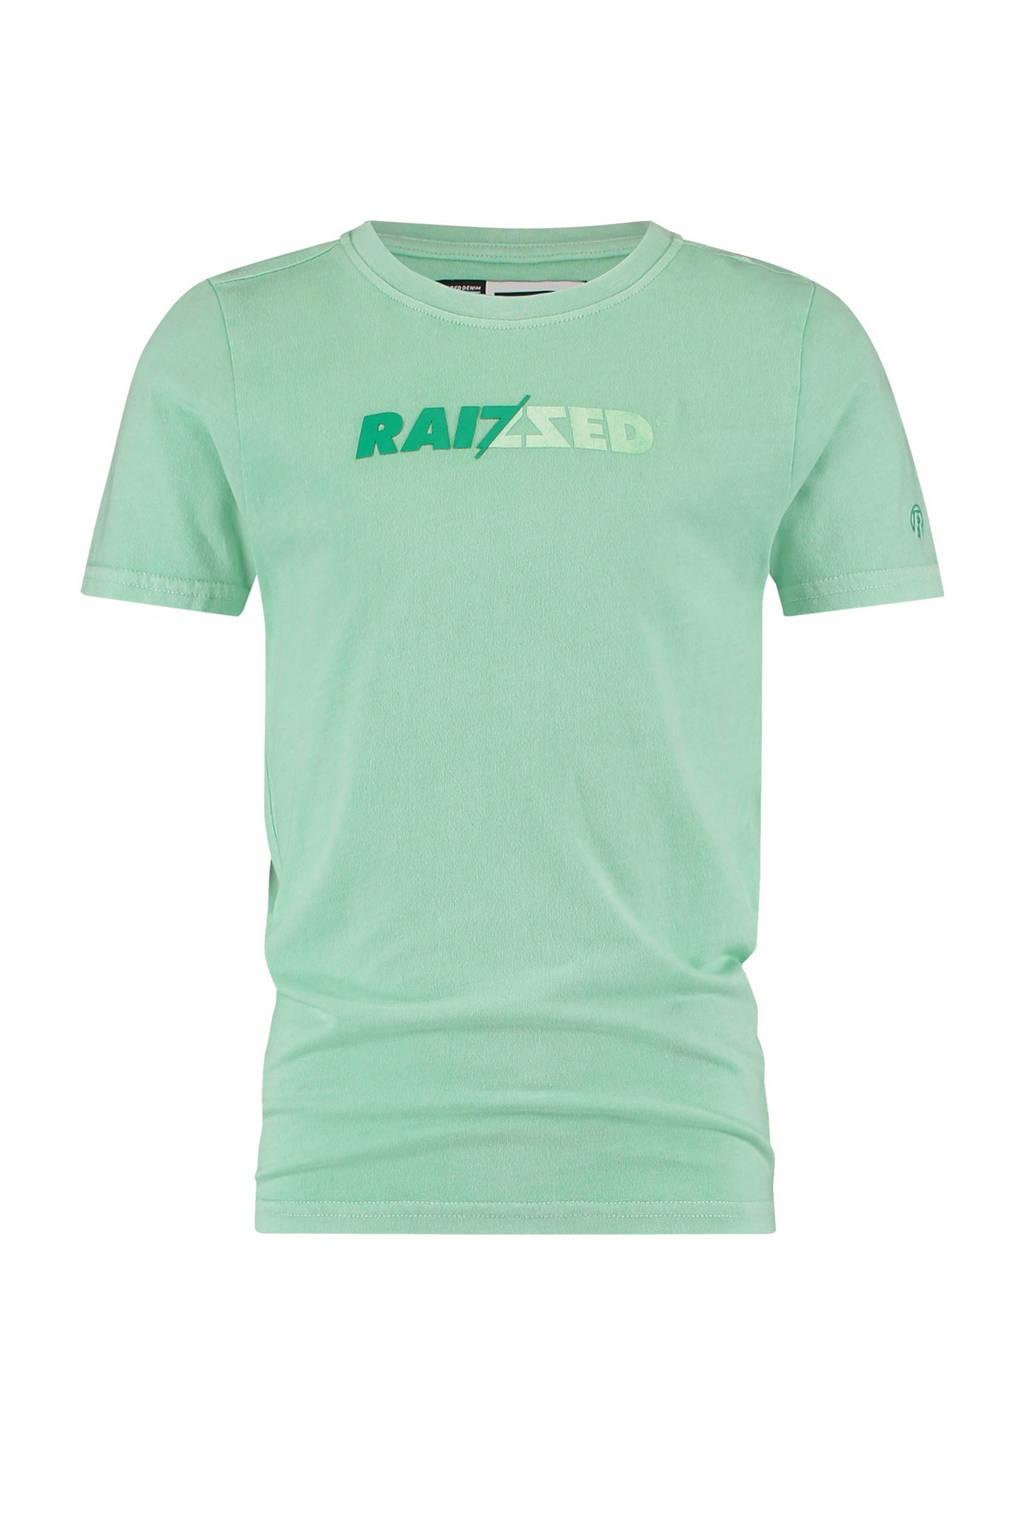 Raizzed T-shirt Humberto met logo pastel groen, Pastel Groen